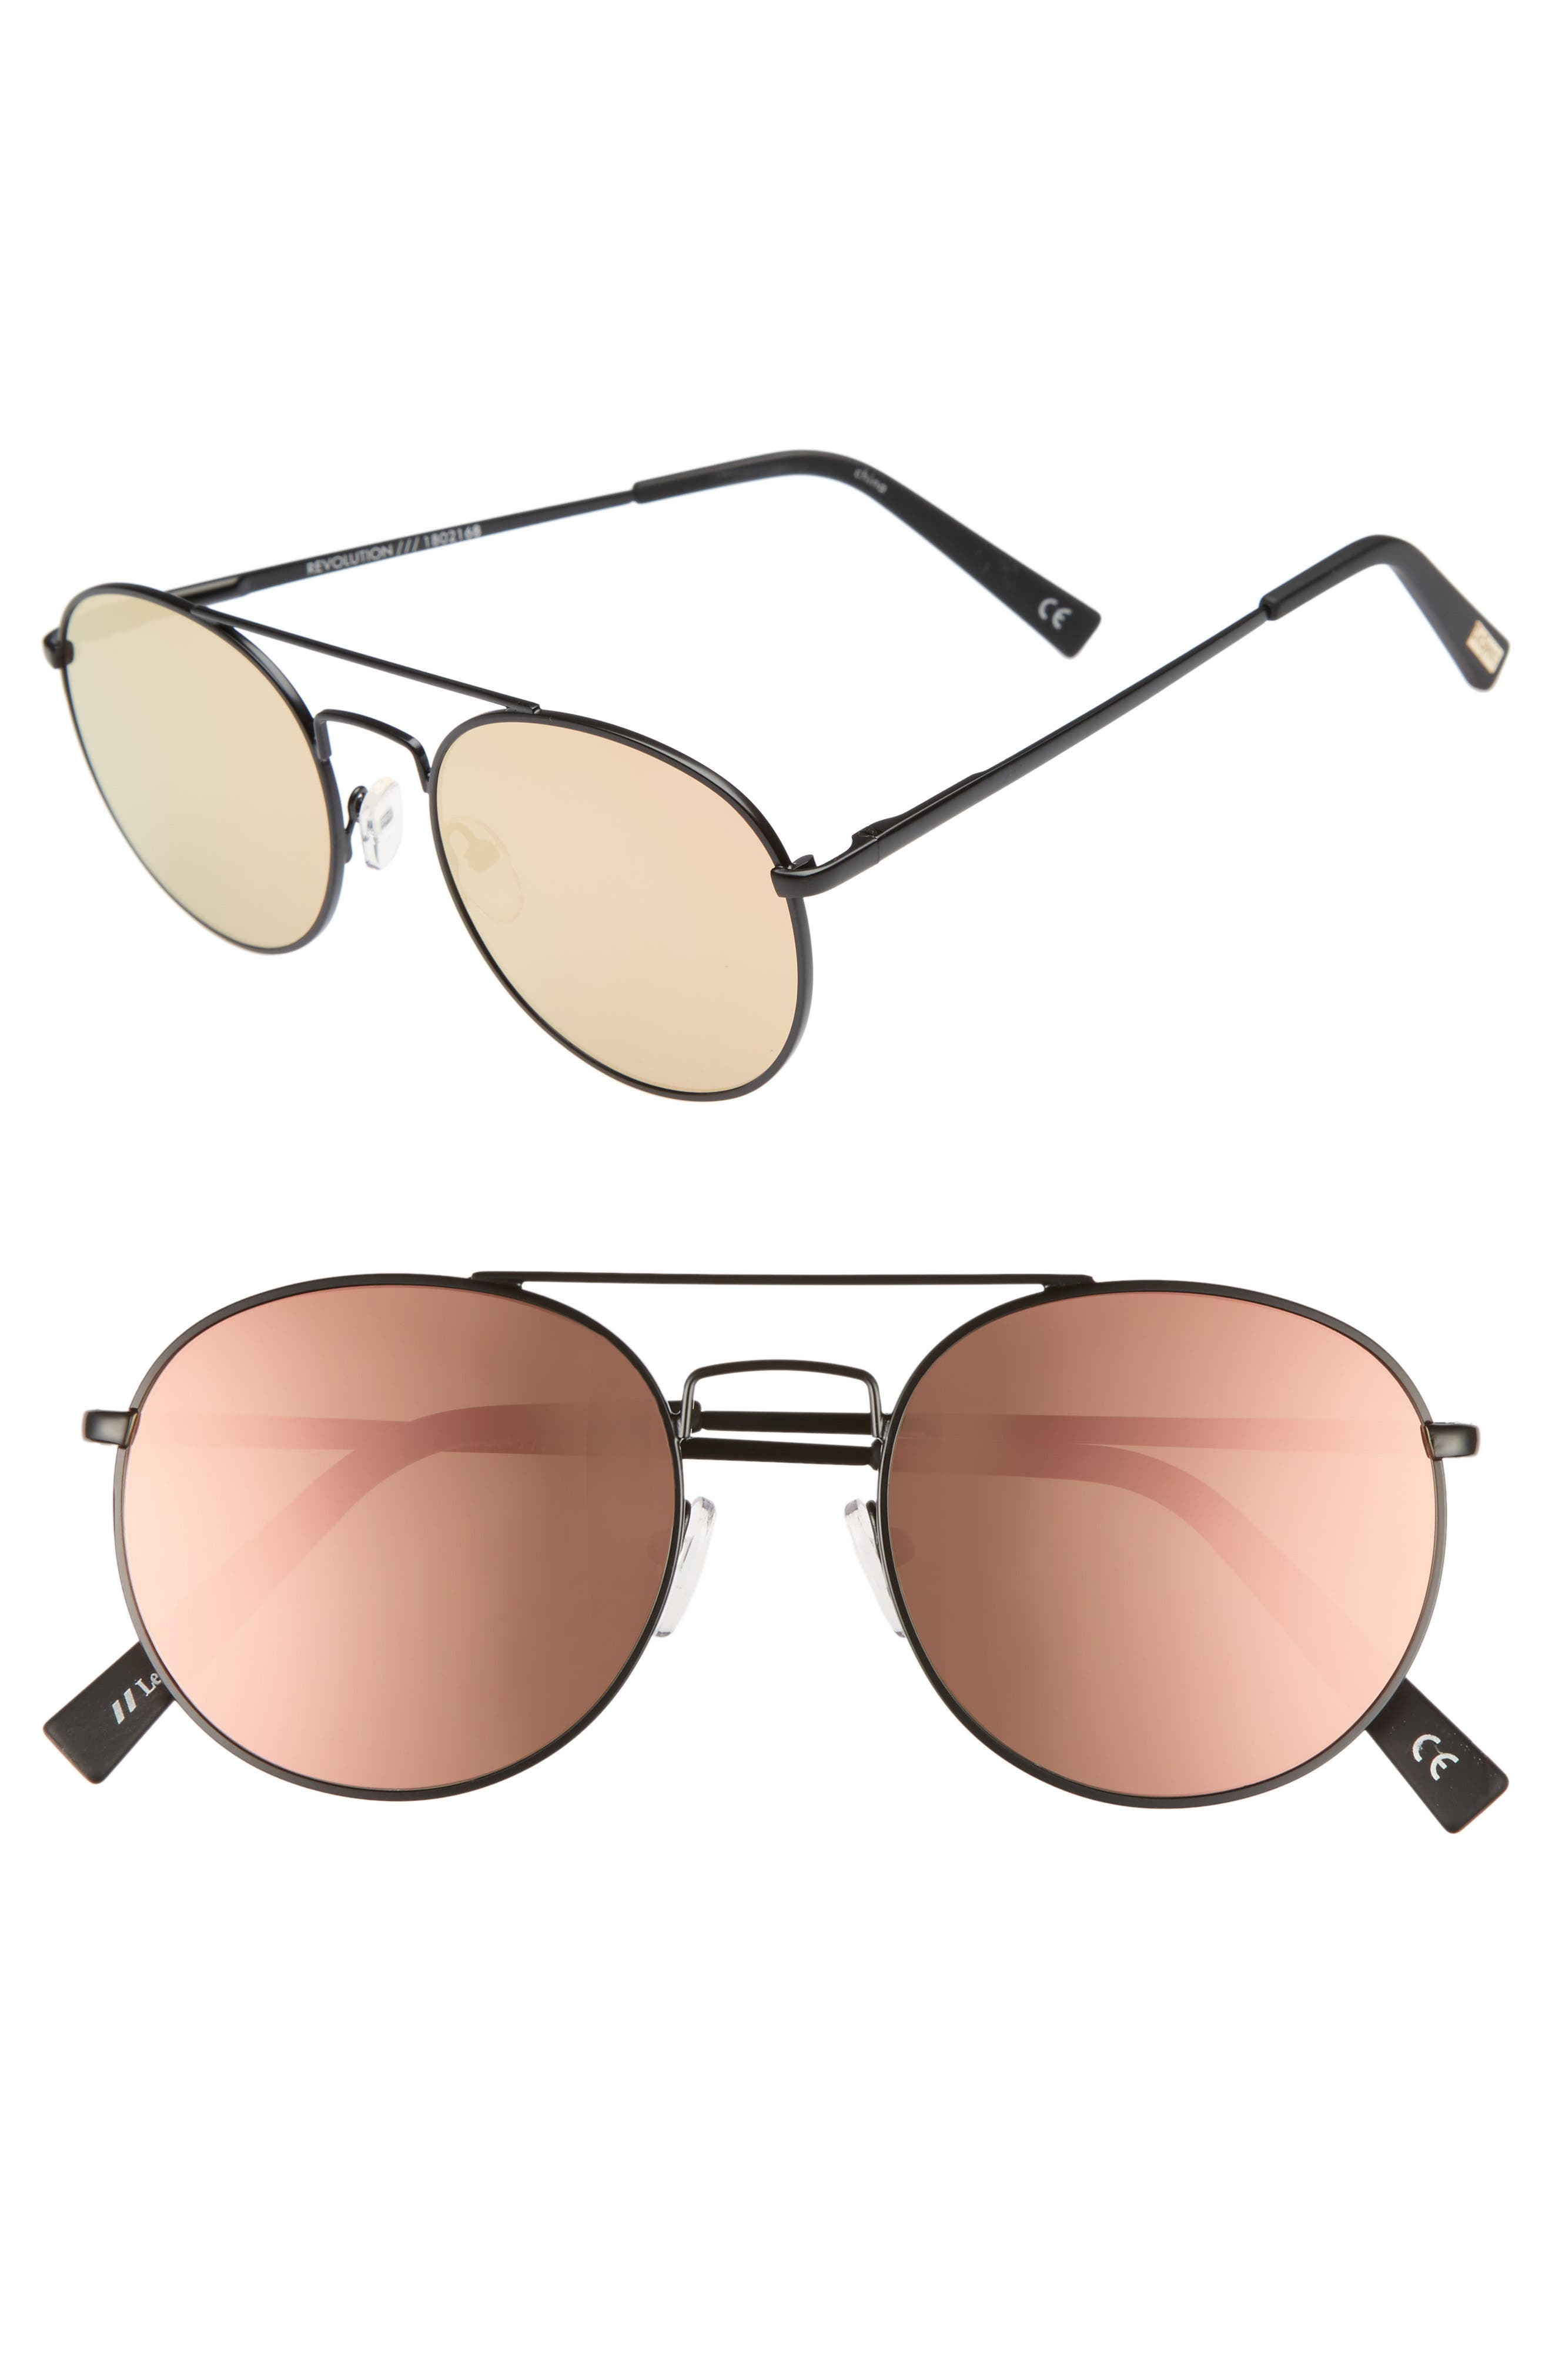 Revolution 53mm Aviator Sunglasses,                         Main,                         color, MATTE BLACK